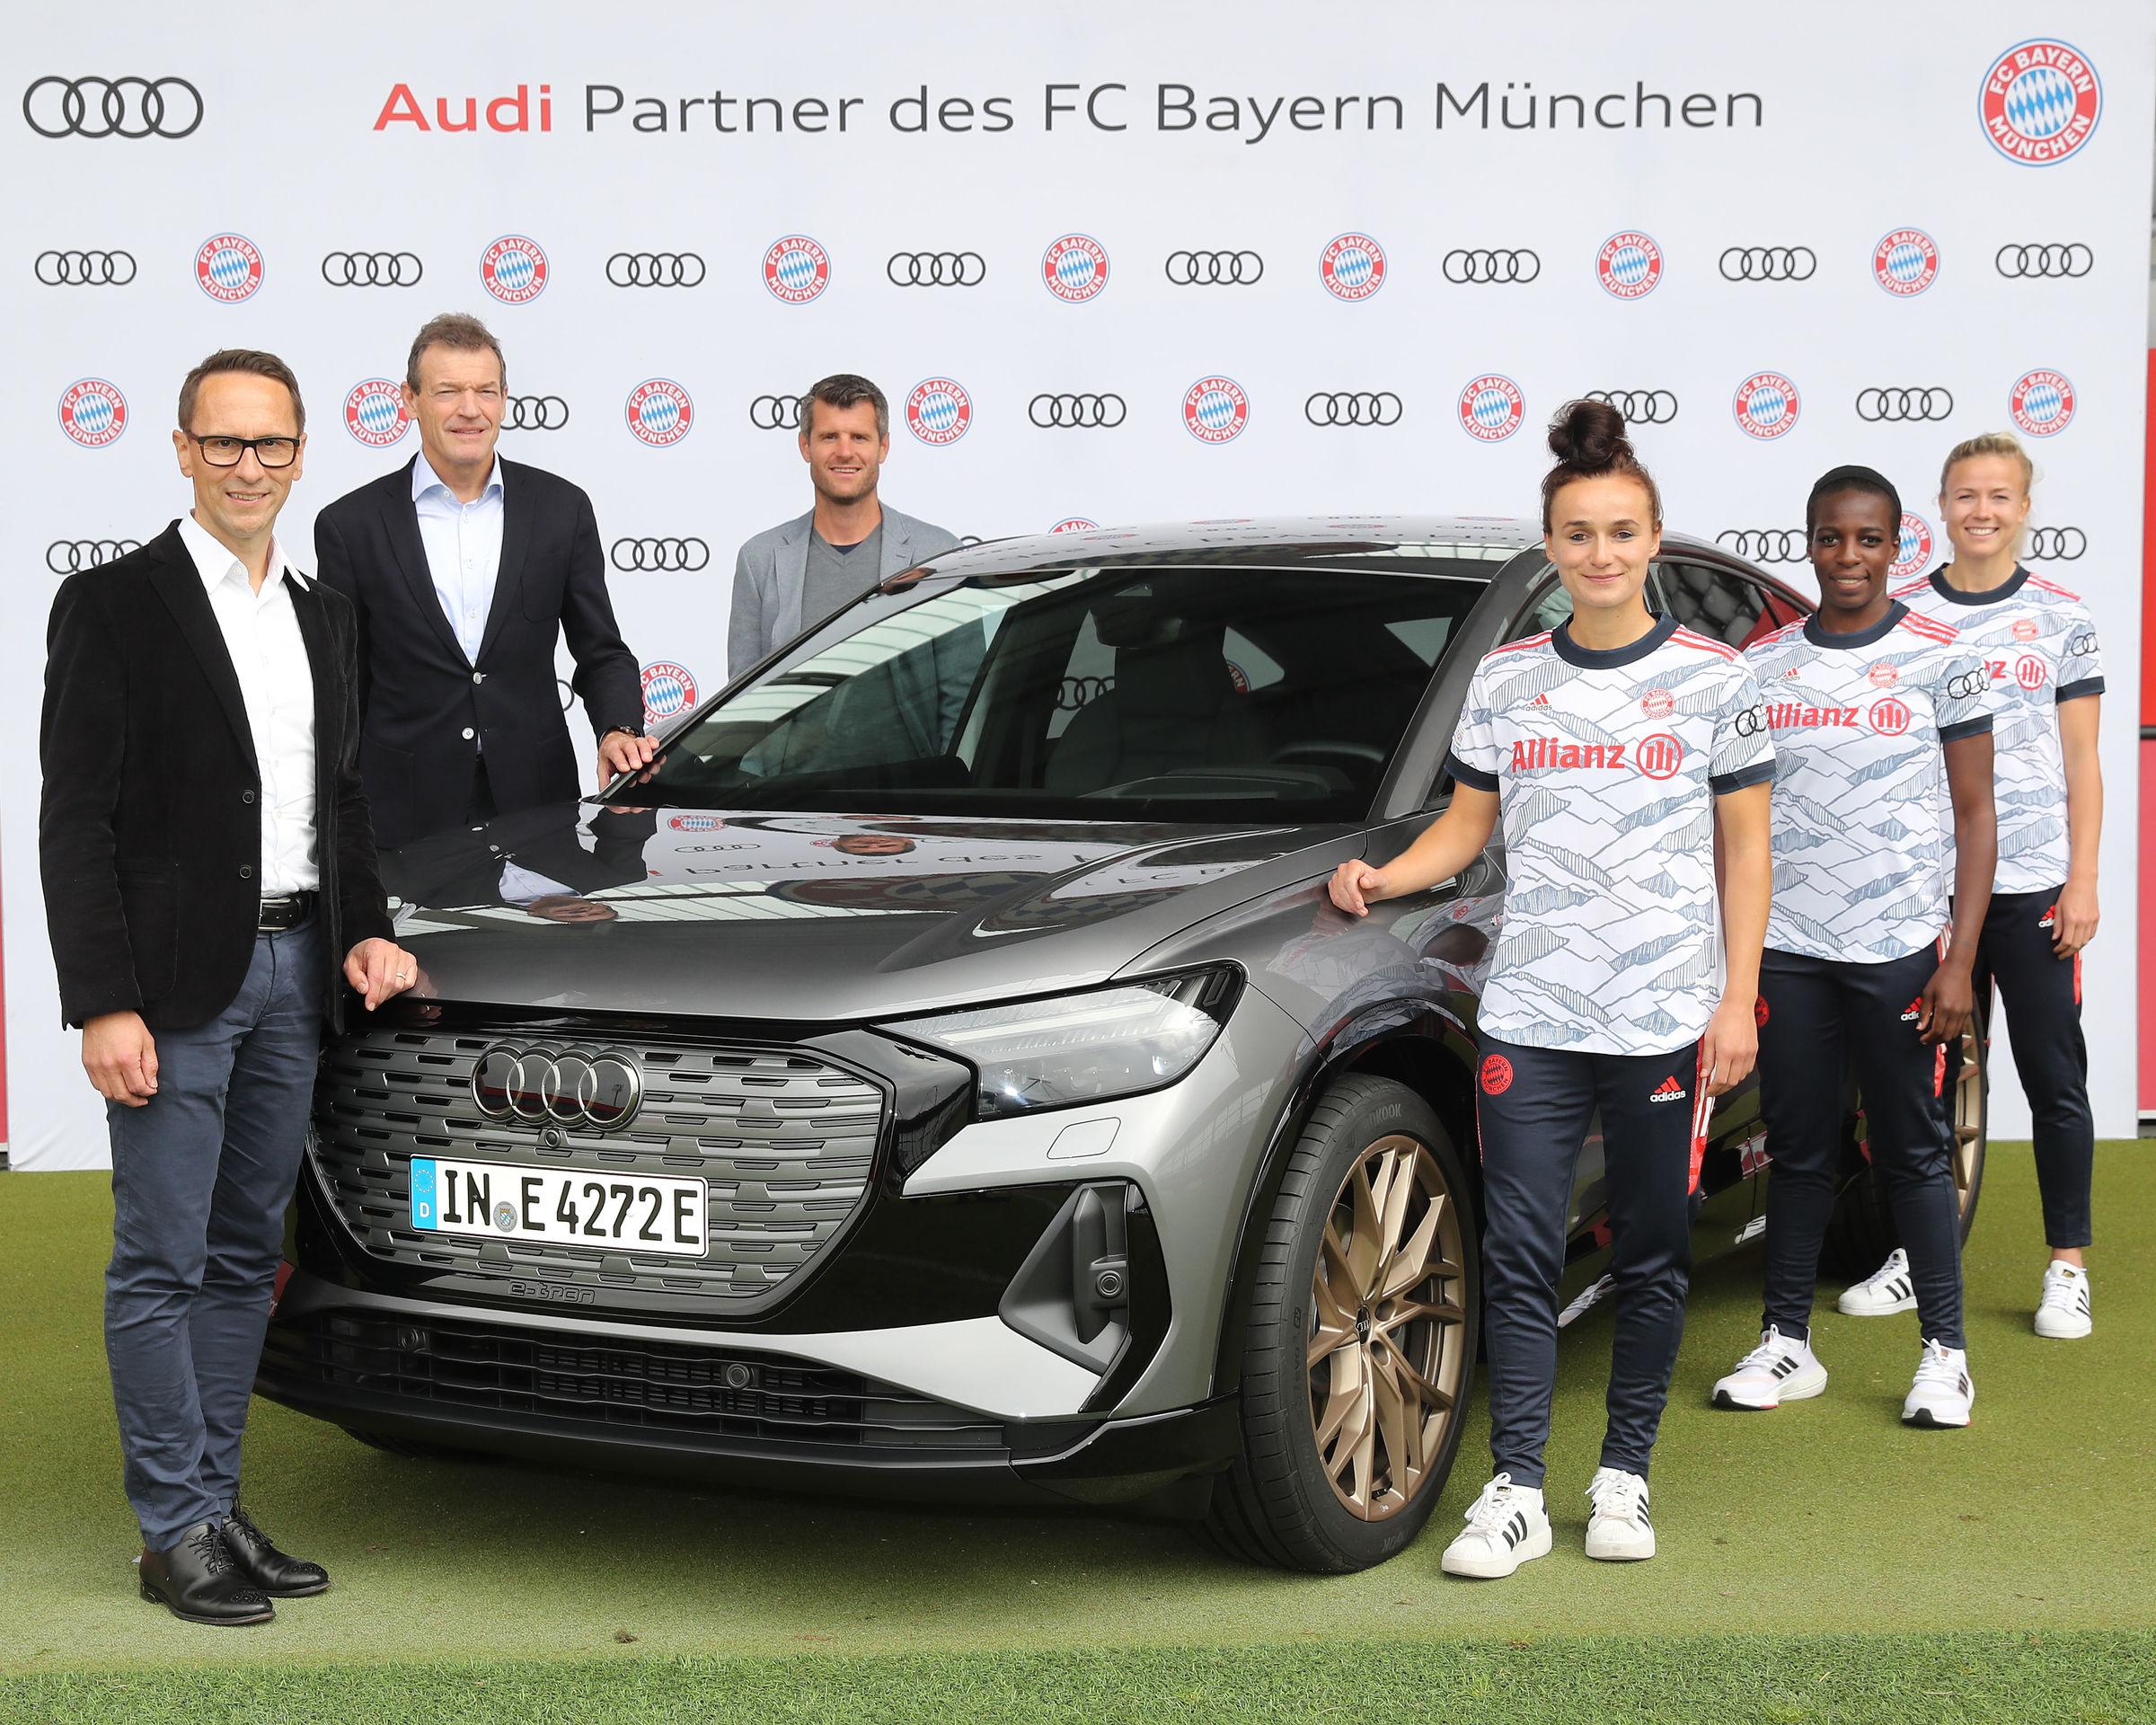 Audi becomes a partner of women's soccer at FC Bayern Munich